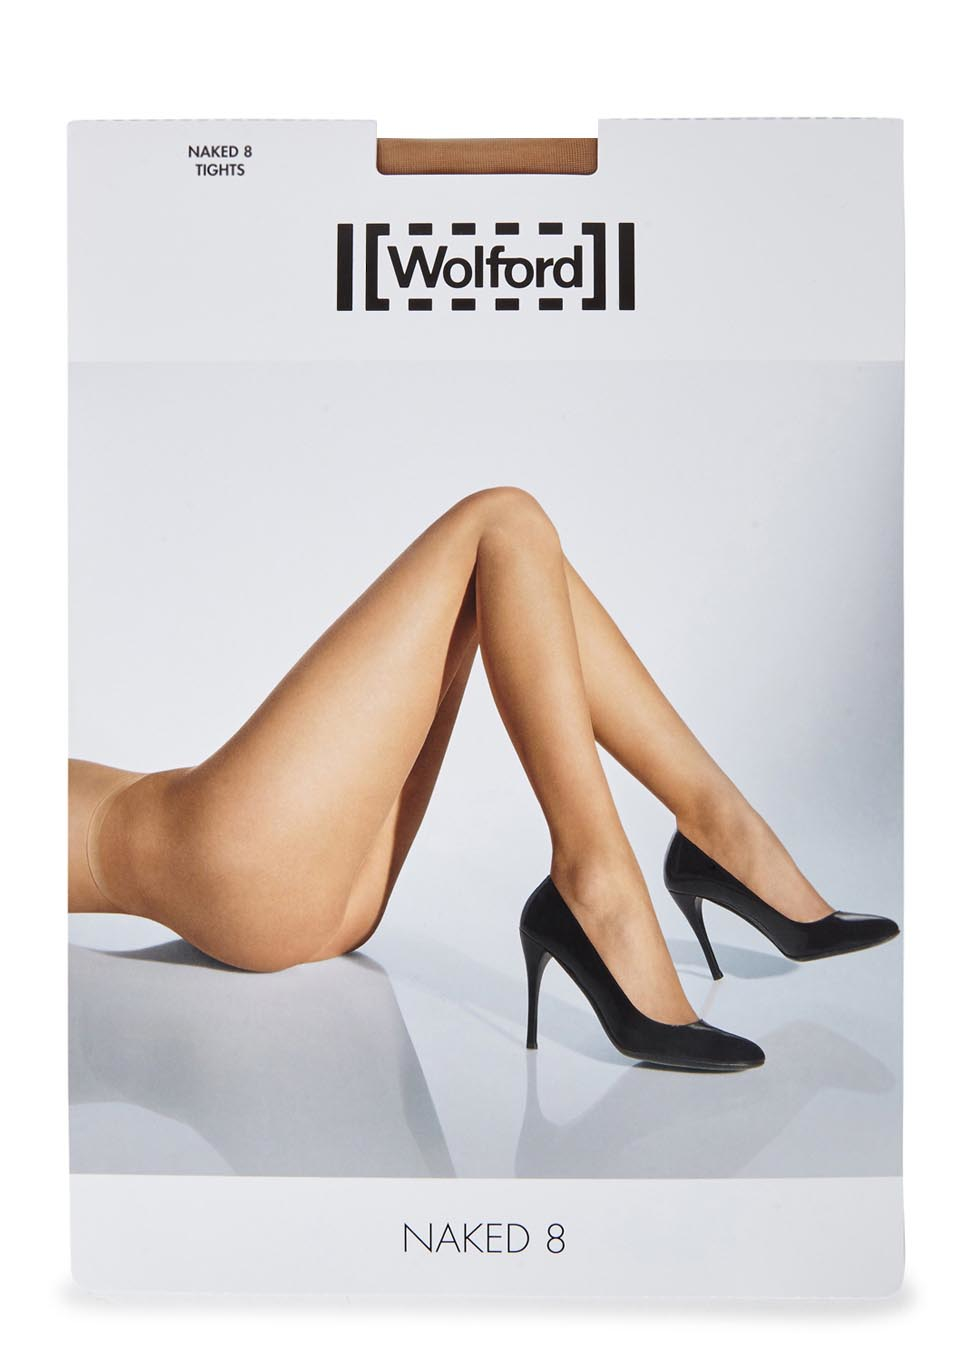 d05932de84cd12 Wolford Naked 8 Denier Caramel Tights - Size L - Lyst